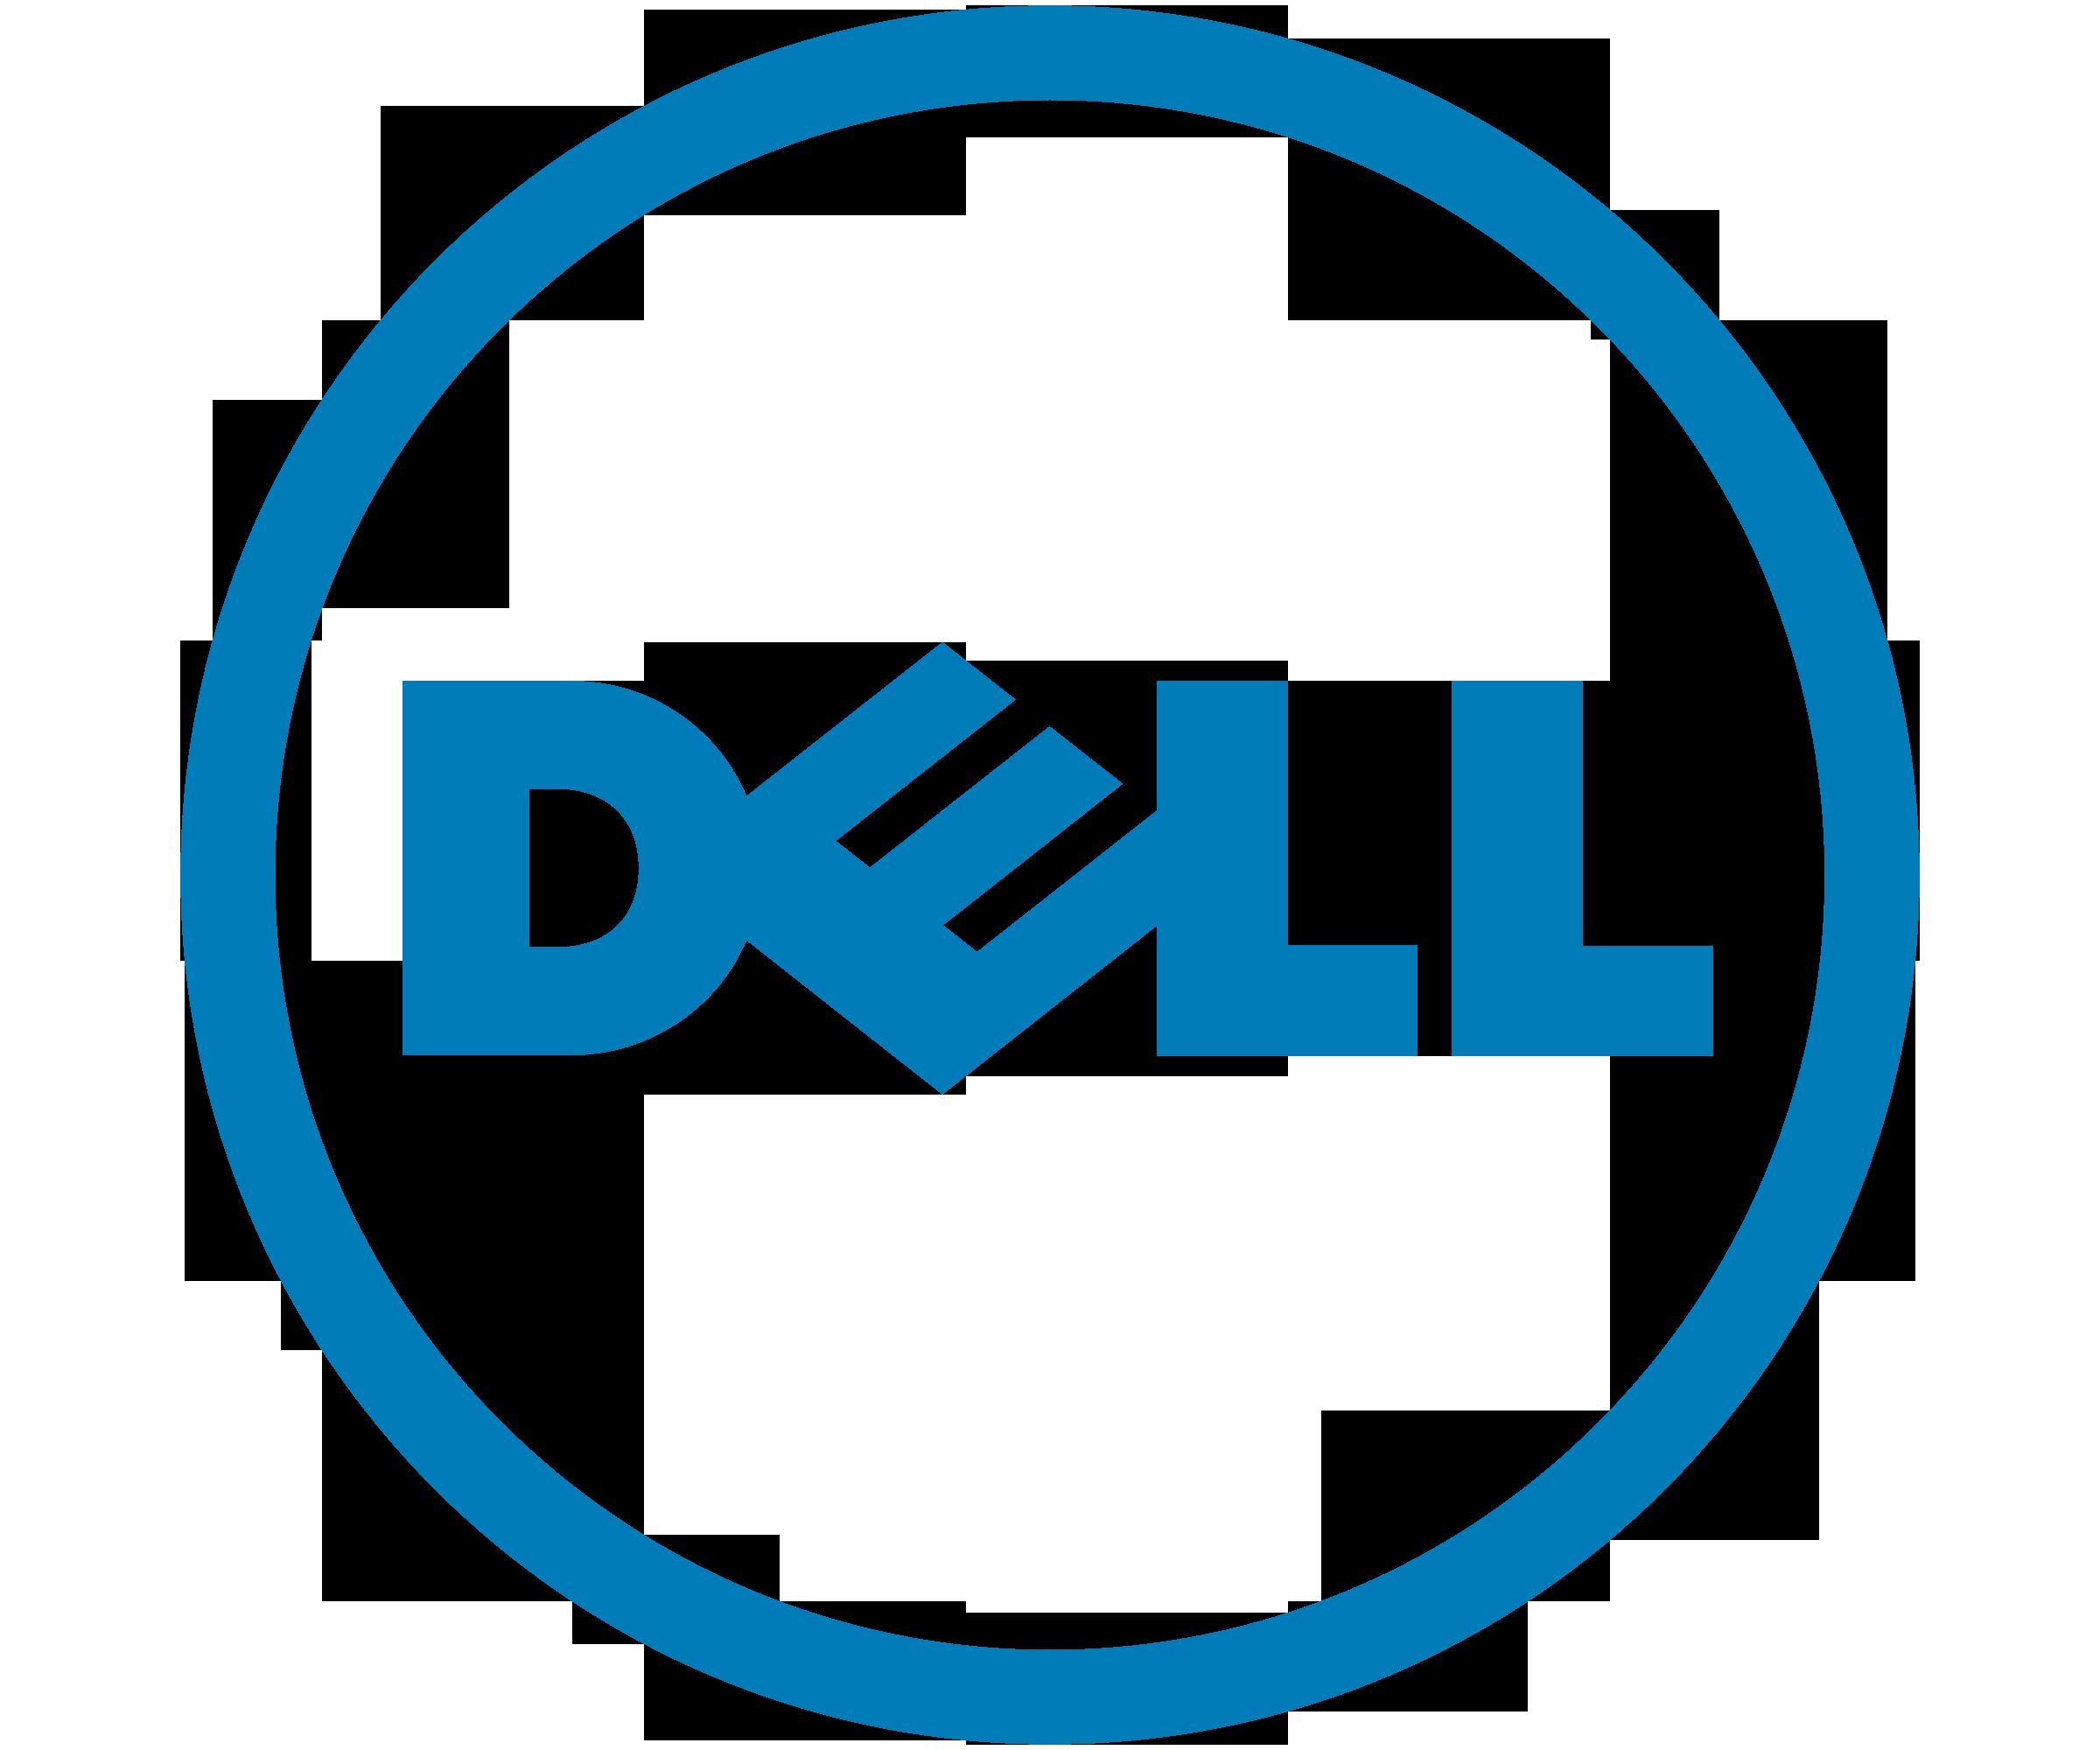 kisspng-dell-sonicwall-logo-dell-logo-5b2222efd89601.9953765715289638238872